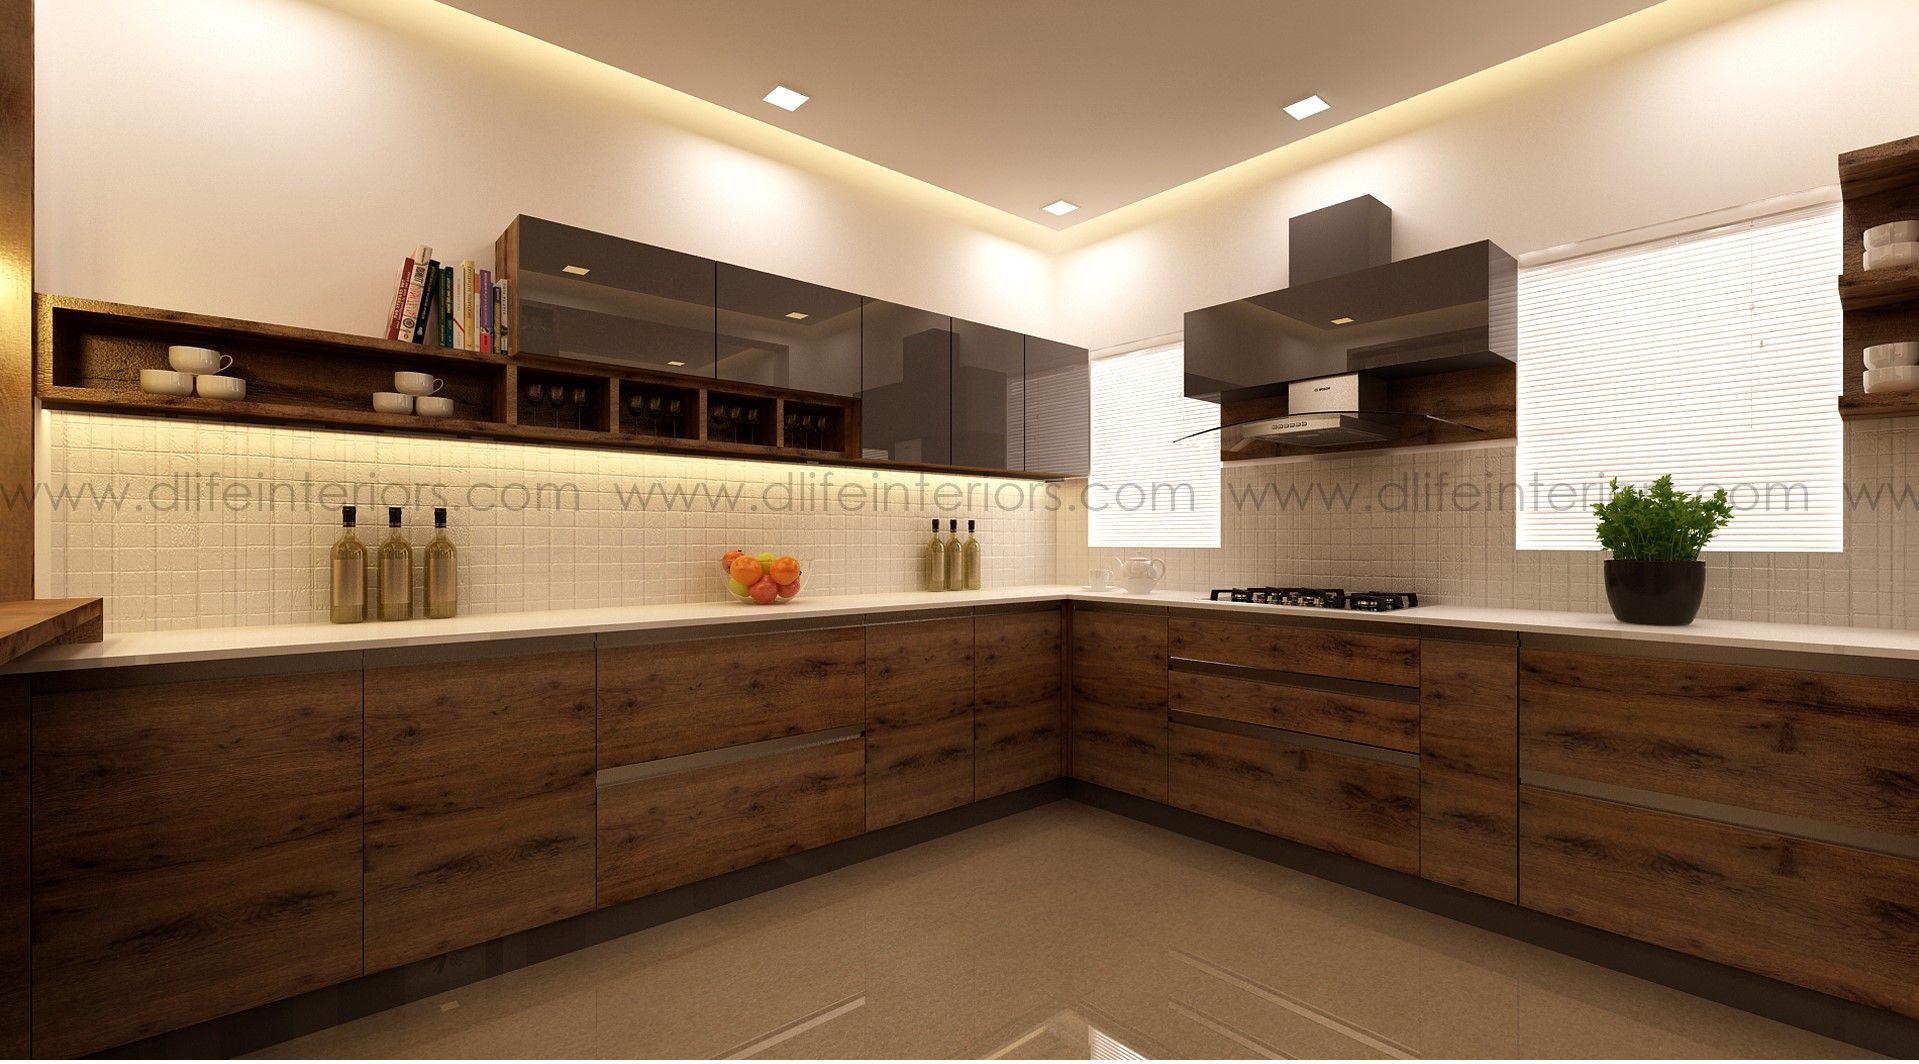 Modern Kitchen With Wood Grain Finish Modern Kitchen Units Kitchen Interior Interior Design Kitchen